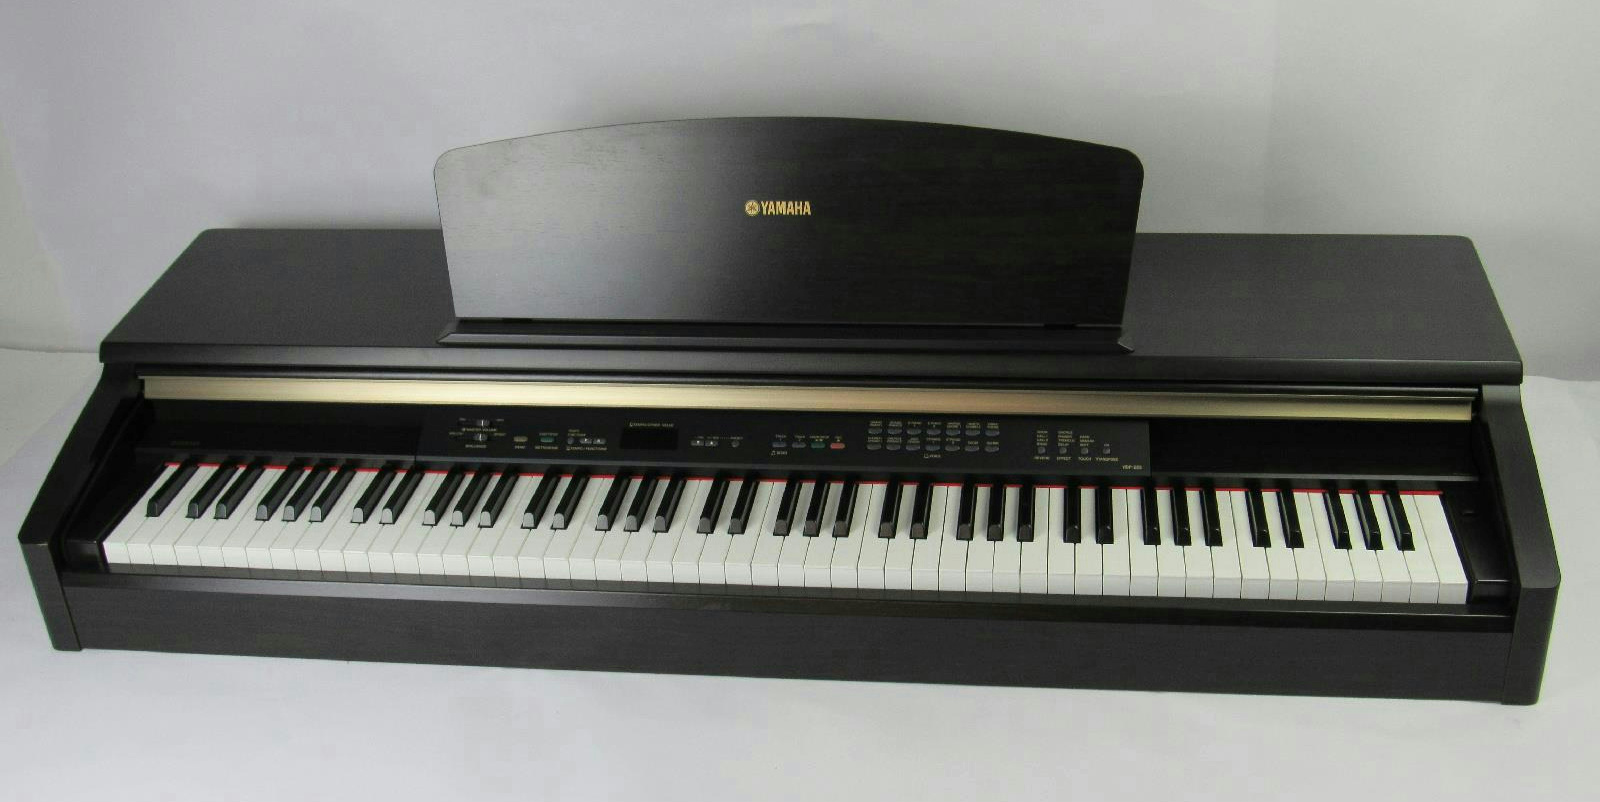 yamaha ydp 223 digital piano 88 key keyboard polyphony tone generator voice ebay. Black Bedroom Furniture Sets. Home Design Ideas